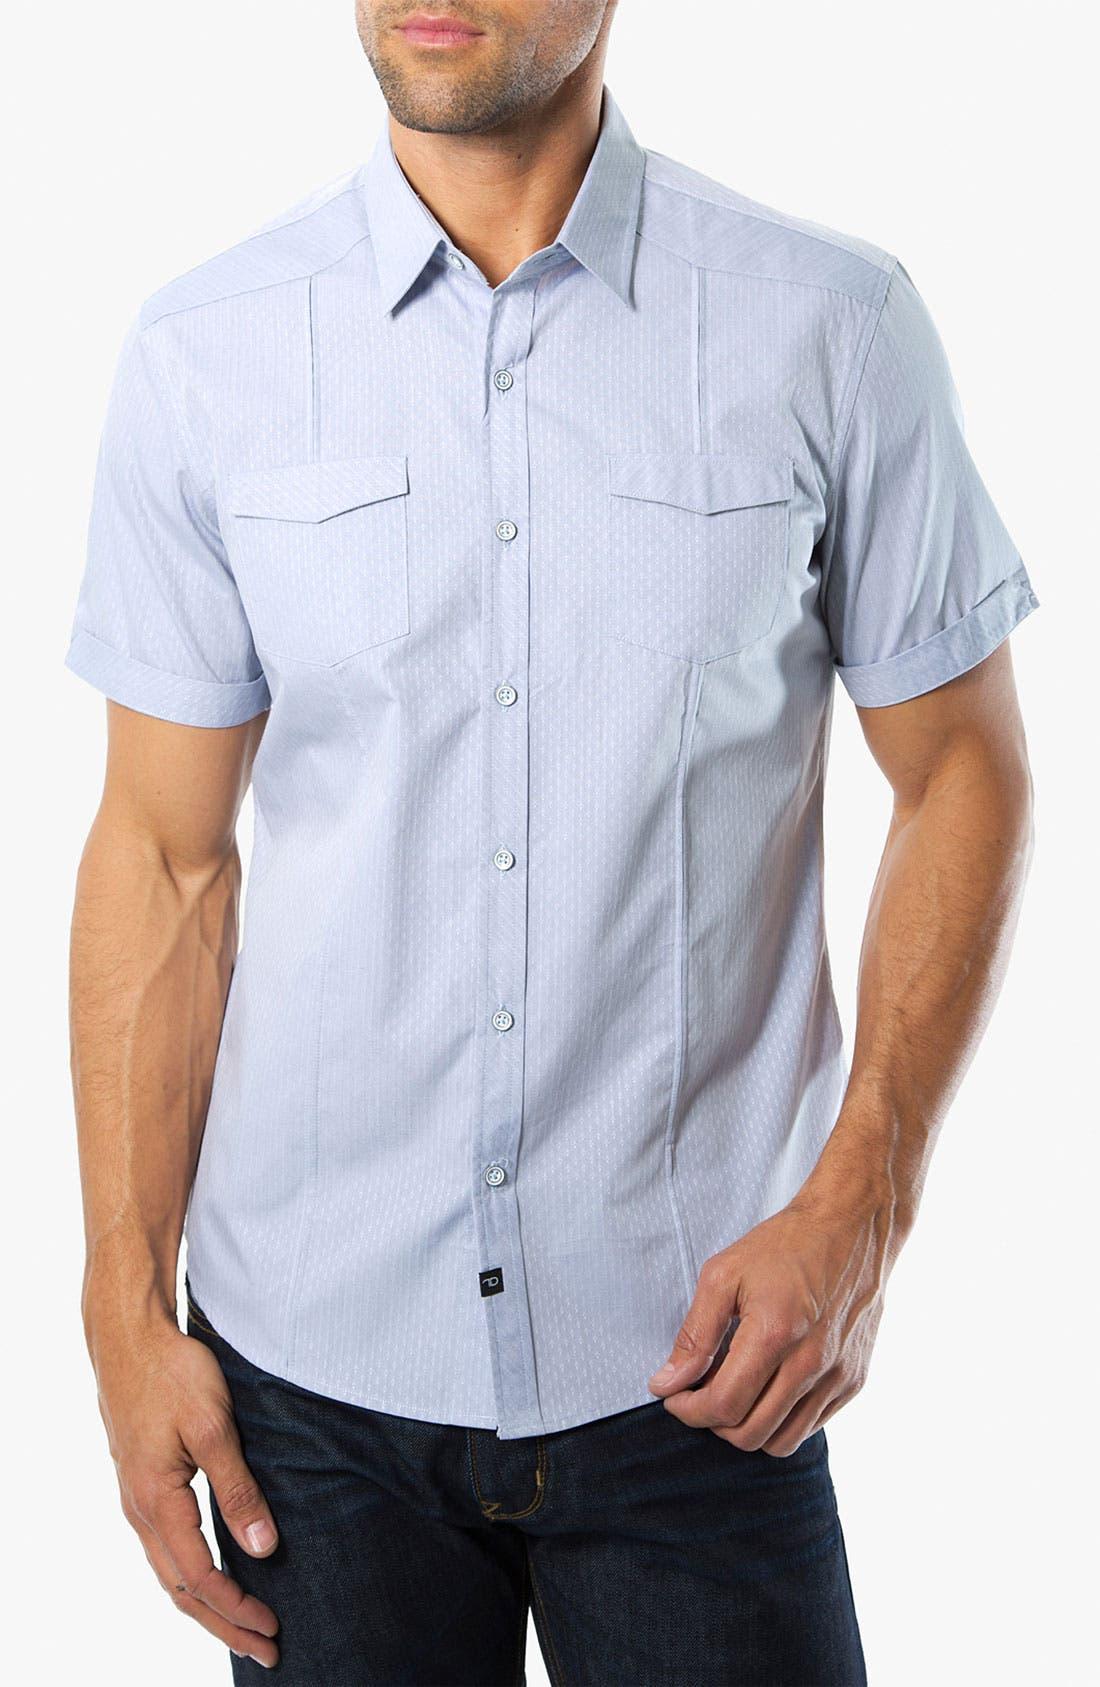 Main Image - 7 Diamonds 'Dreams So Real' Woven Shirt